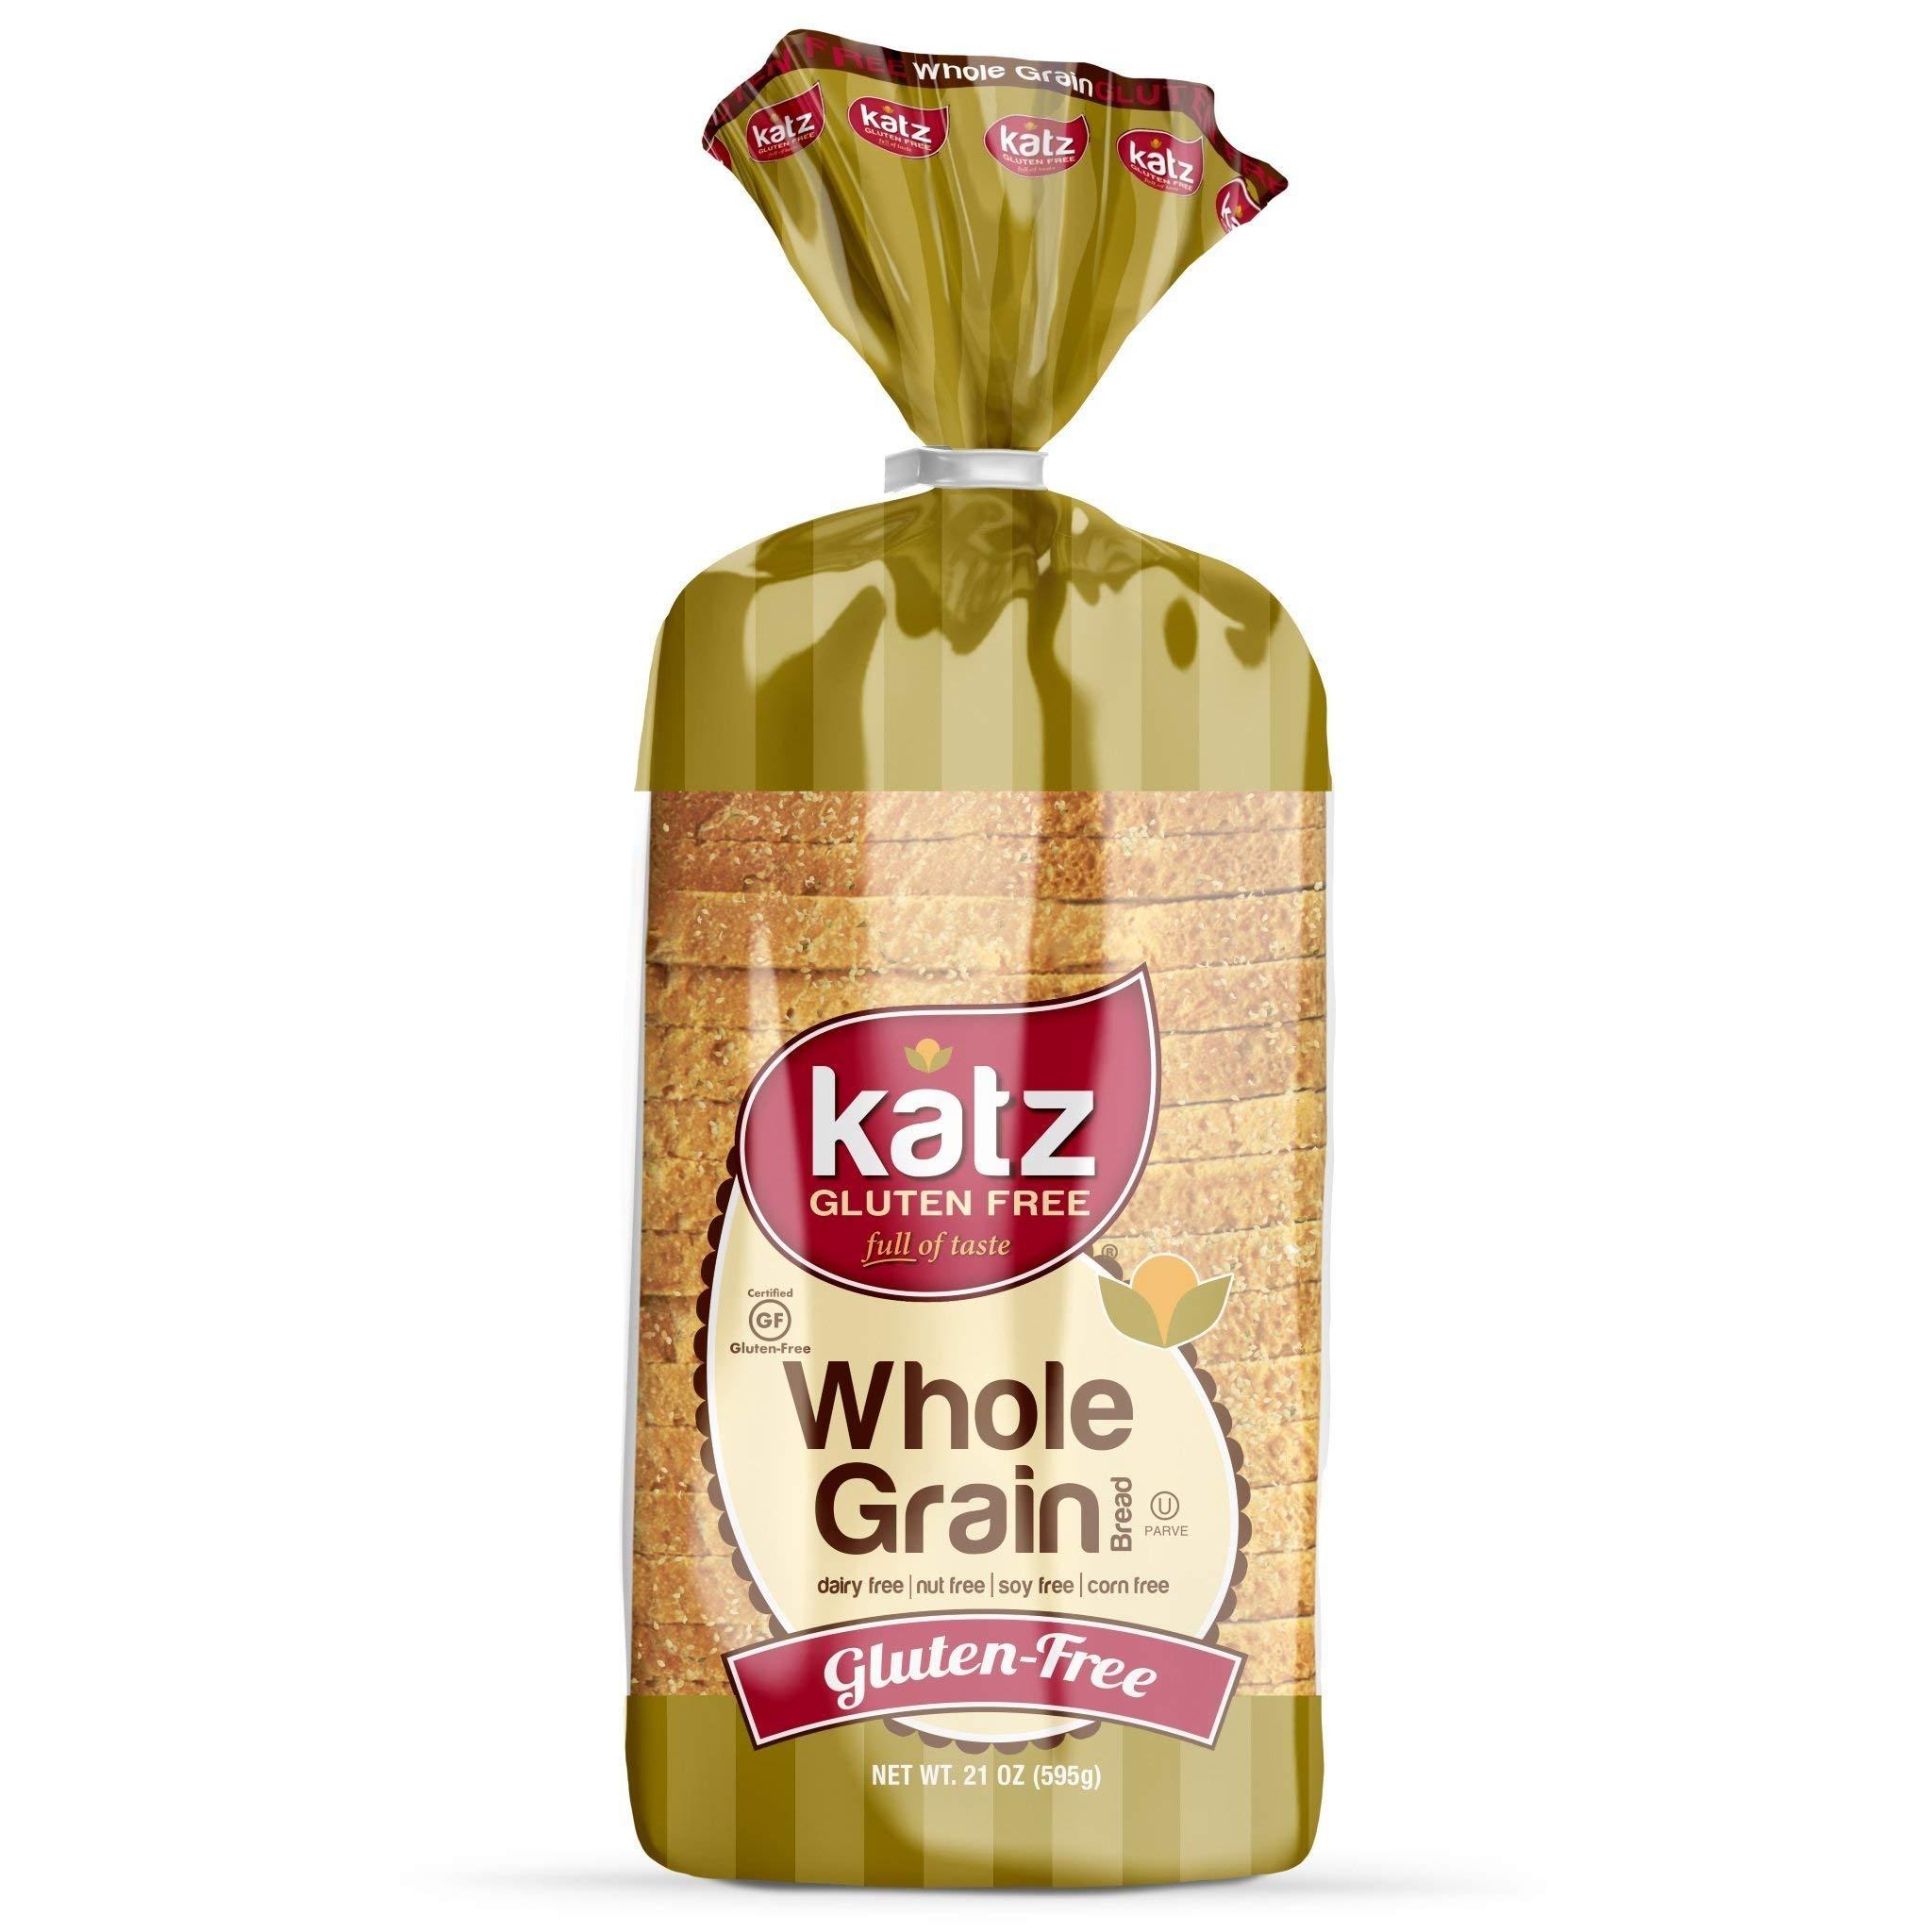 Katz Gluten Free Whole Grain Bread | Dairy, Nut, Soy and Gluten Free | Kosher (6 Packs of 1 Sliced Loaf, 21 Ounce Each) by Katz Gluten Free